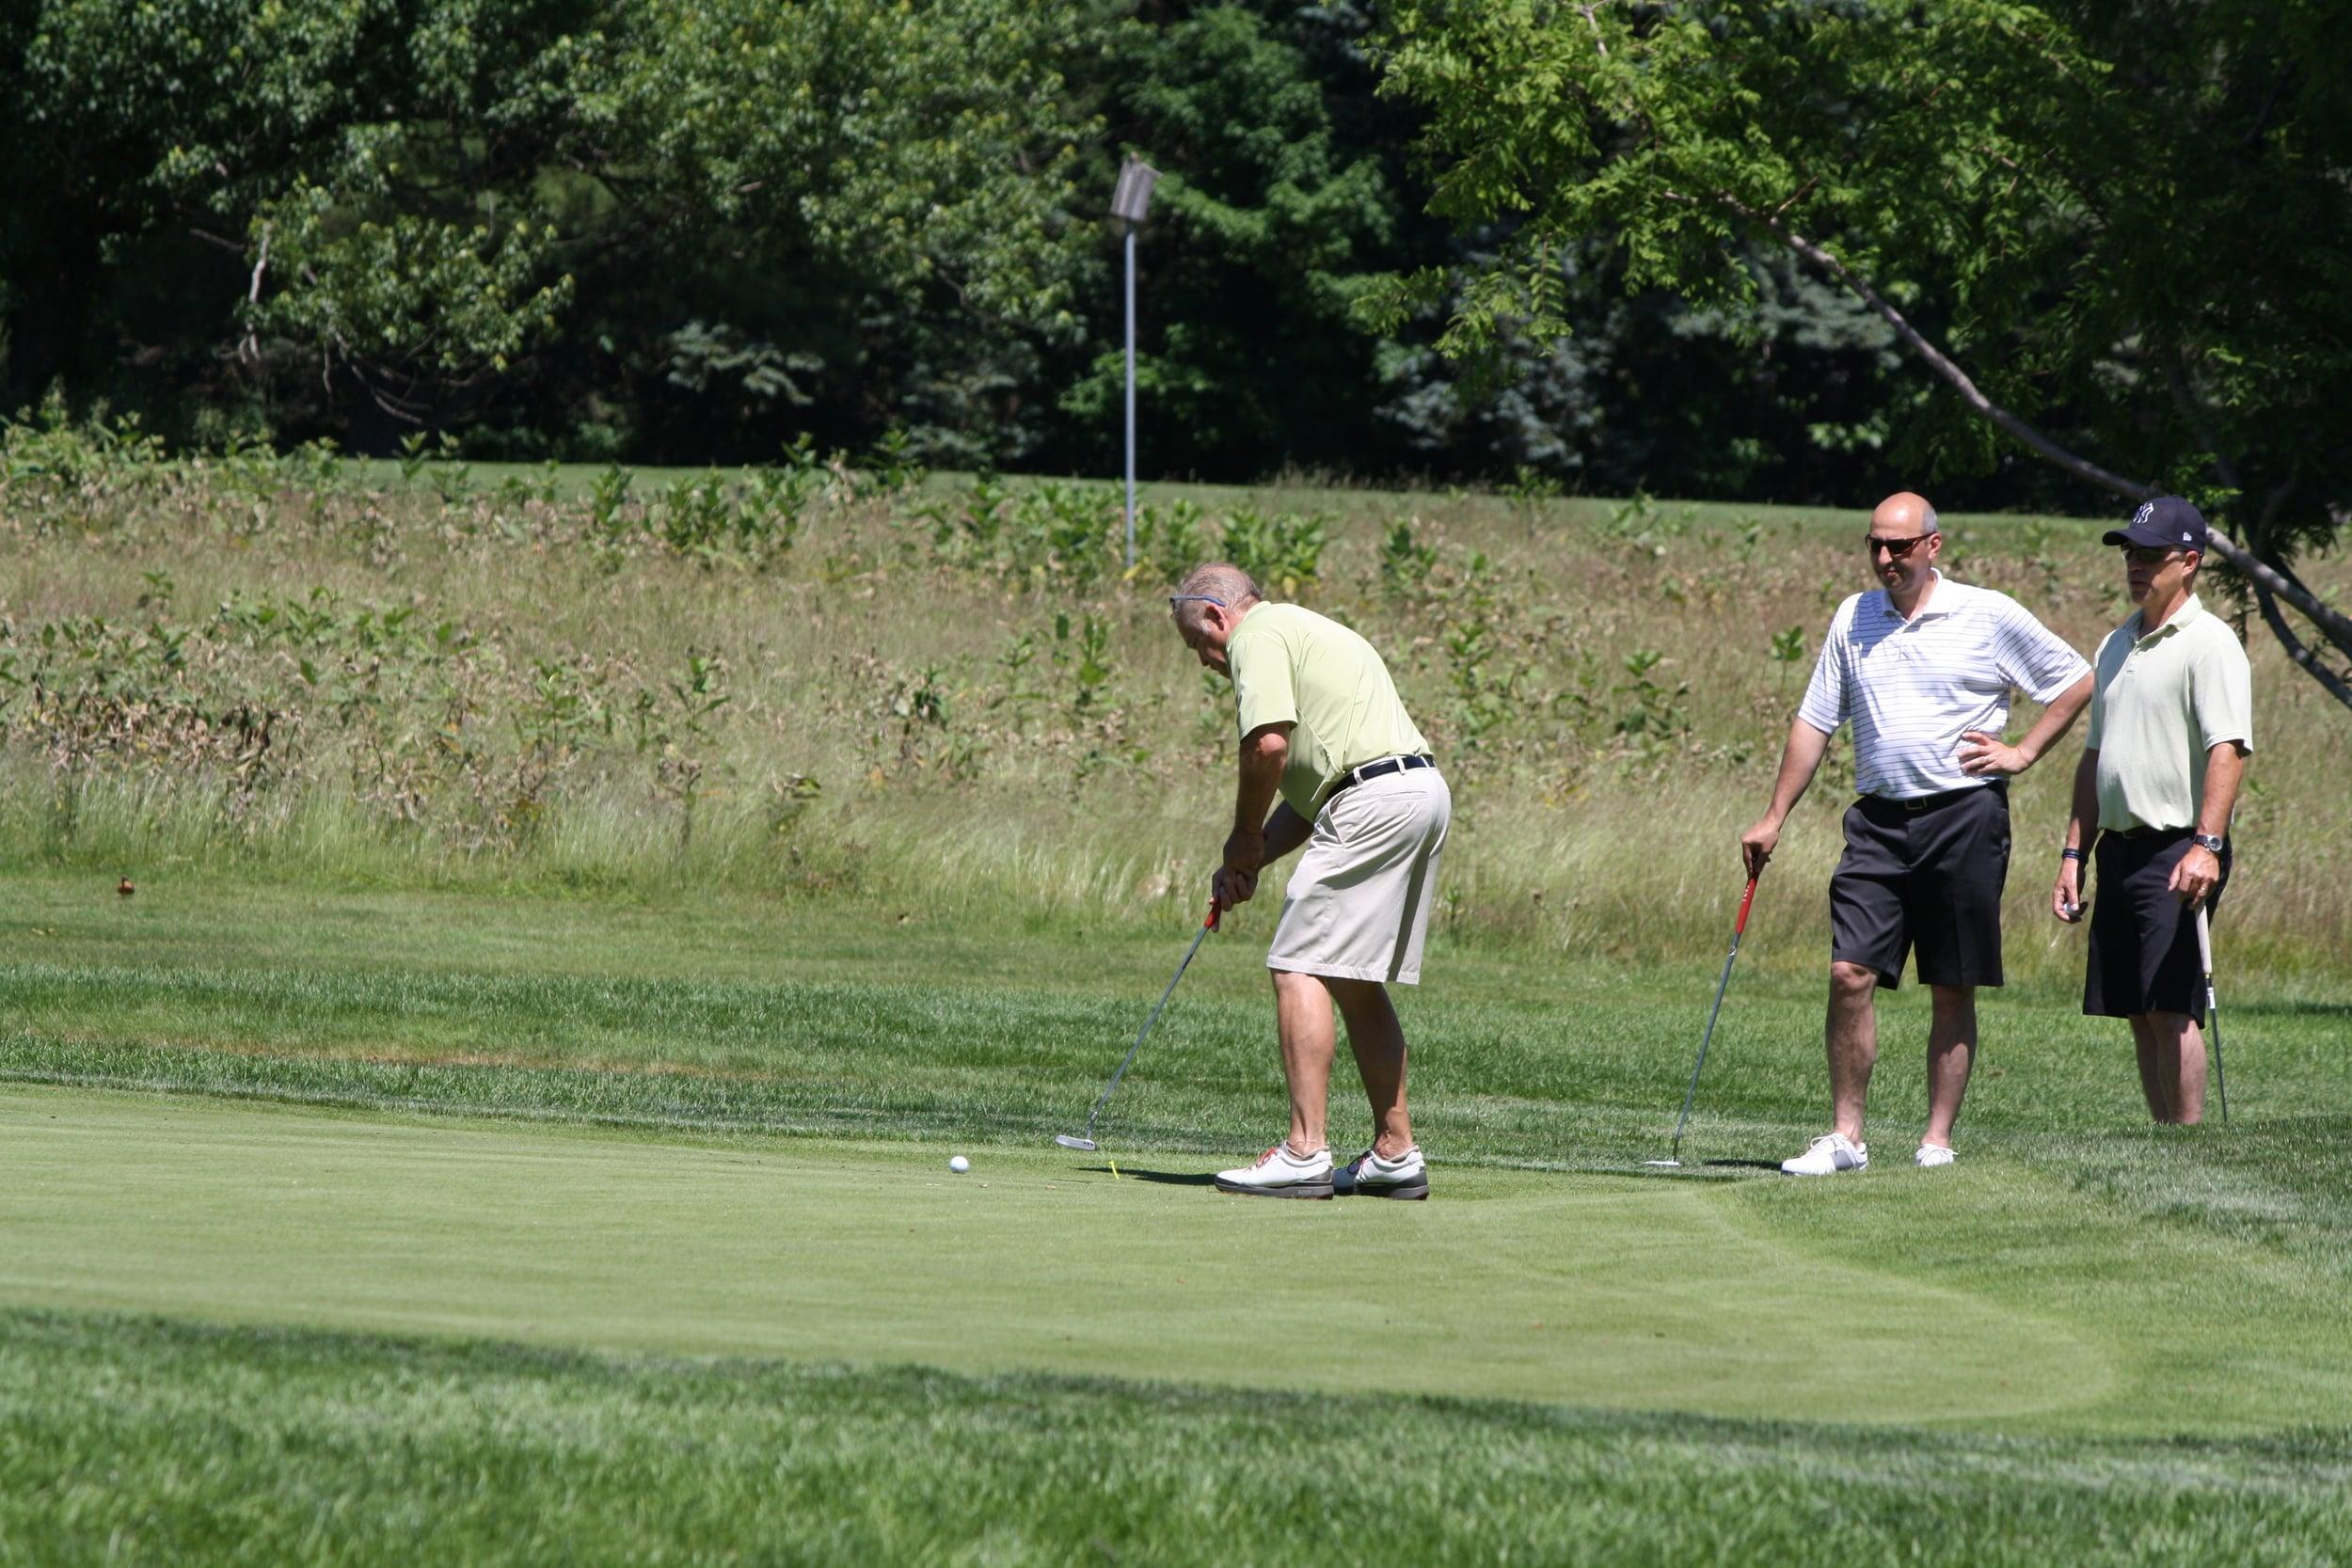 061614 rrcc golf trudell team.jpg